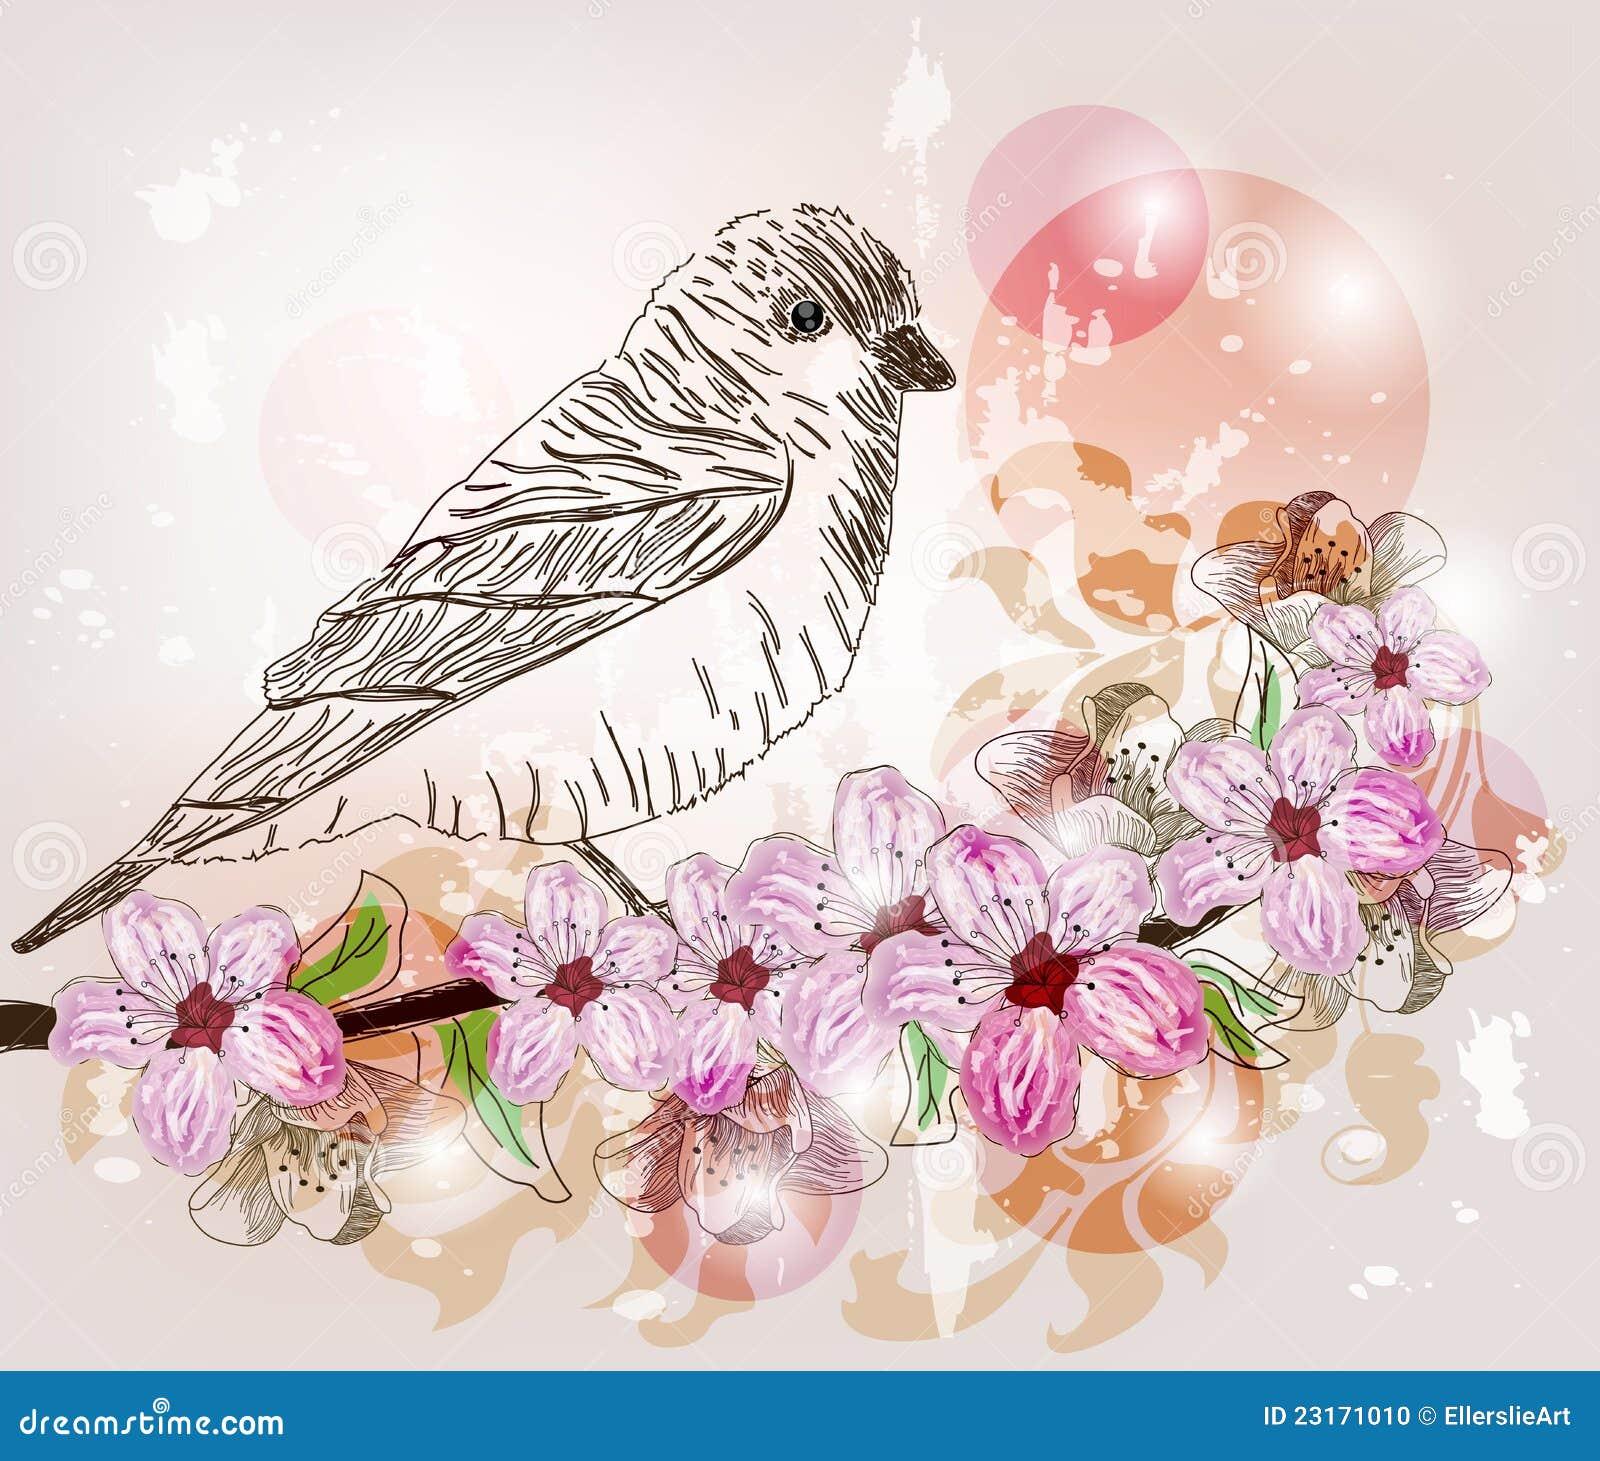 spring scene with hand drawn bird stock vector